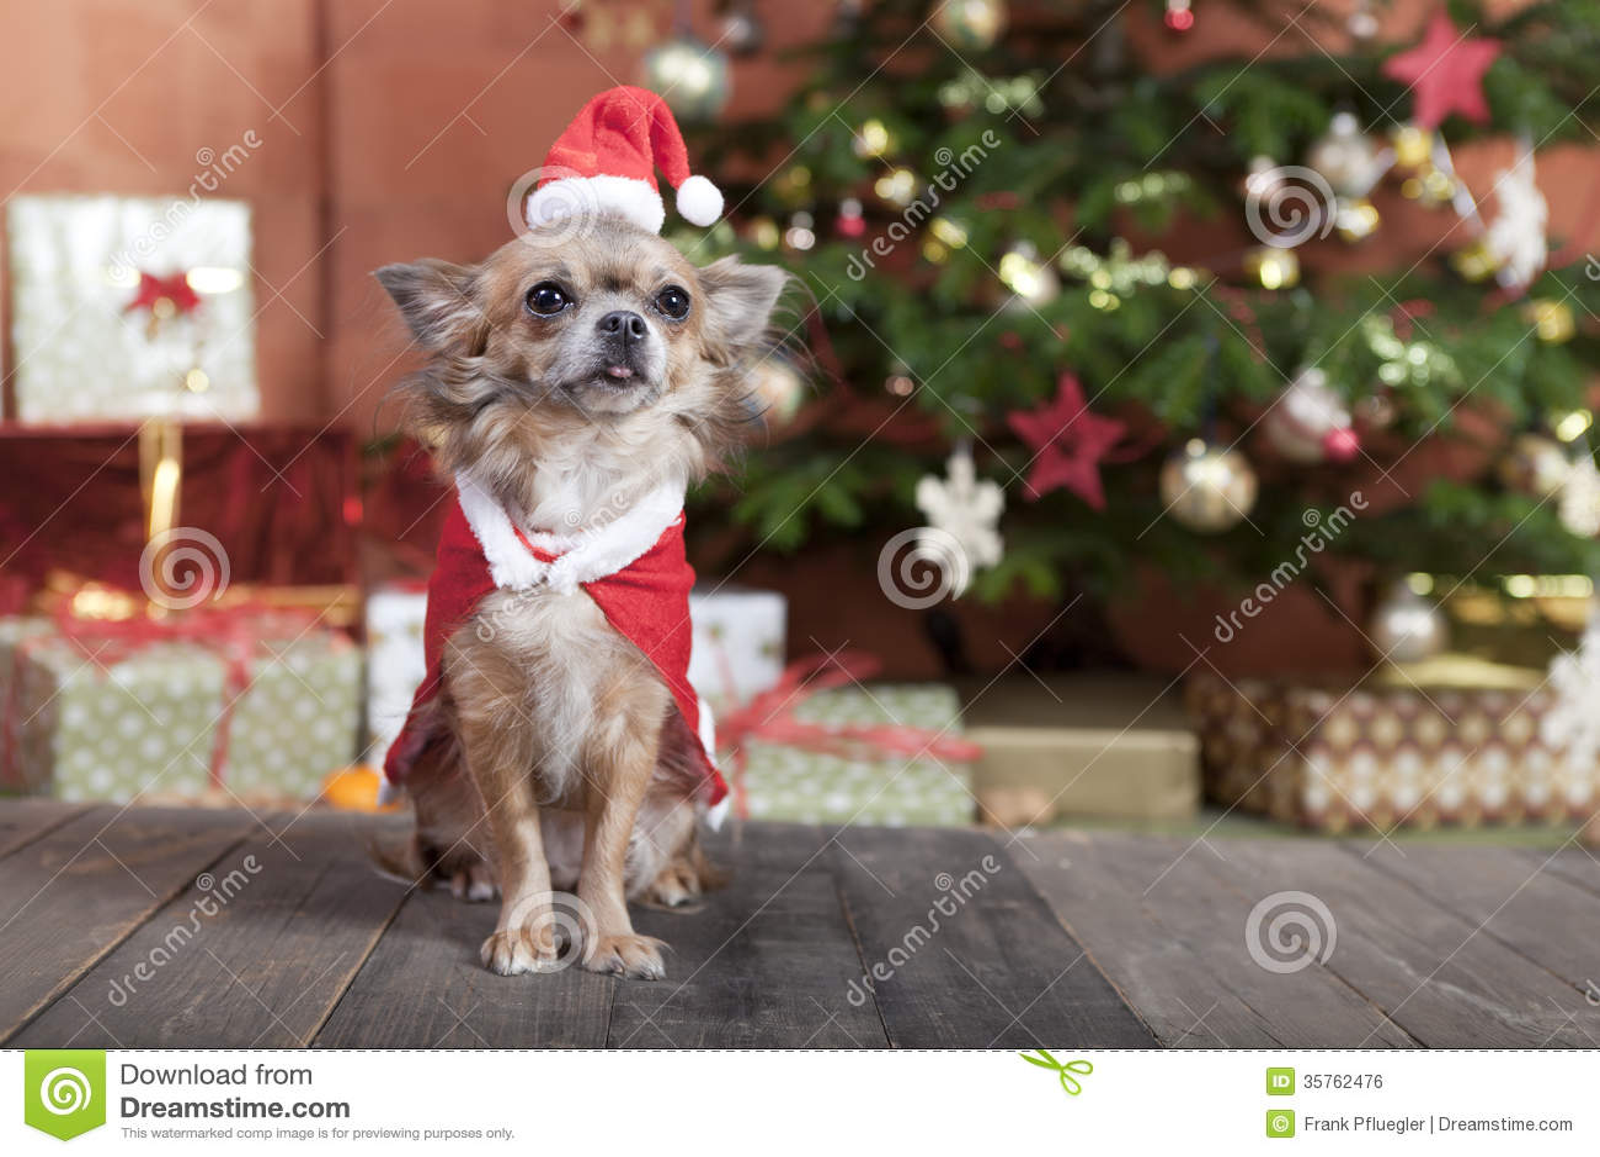 Christmas Dog Before Christmas Tree Royalty Free Stock Image ...